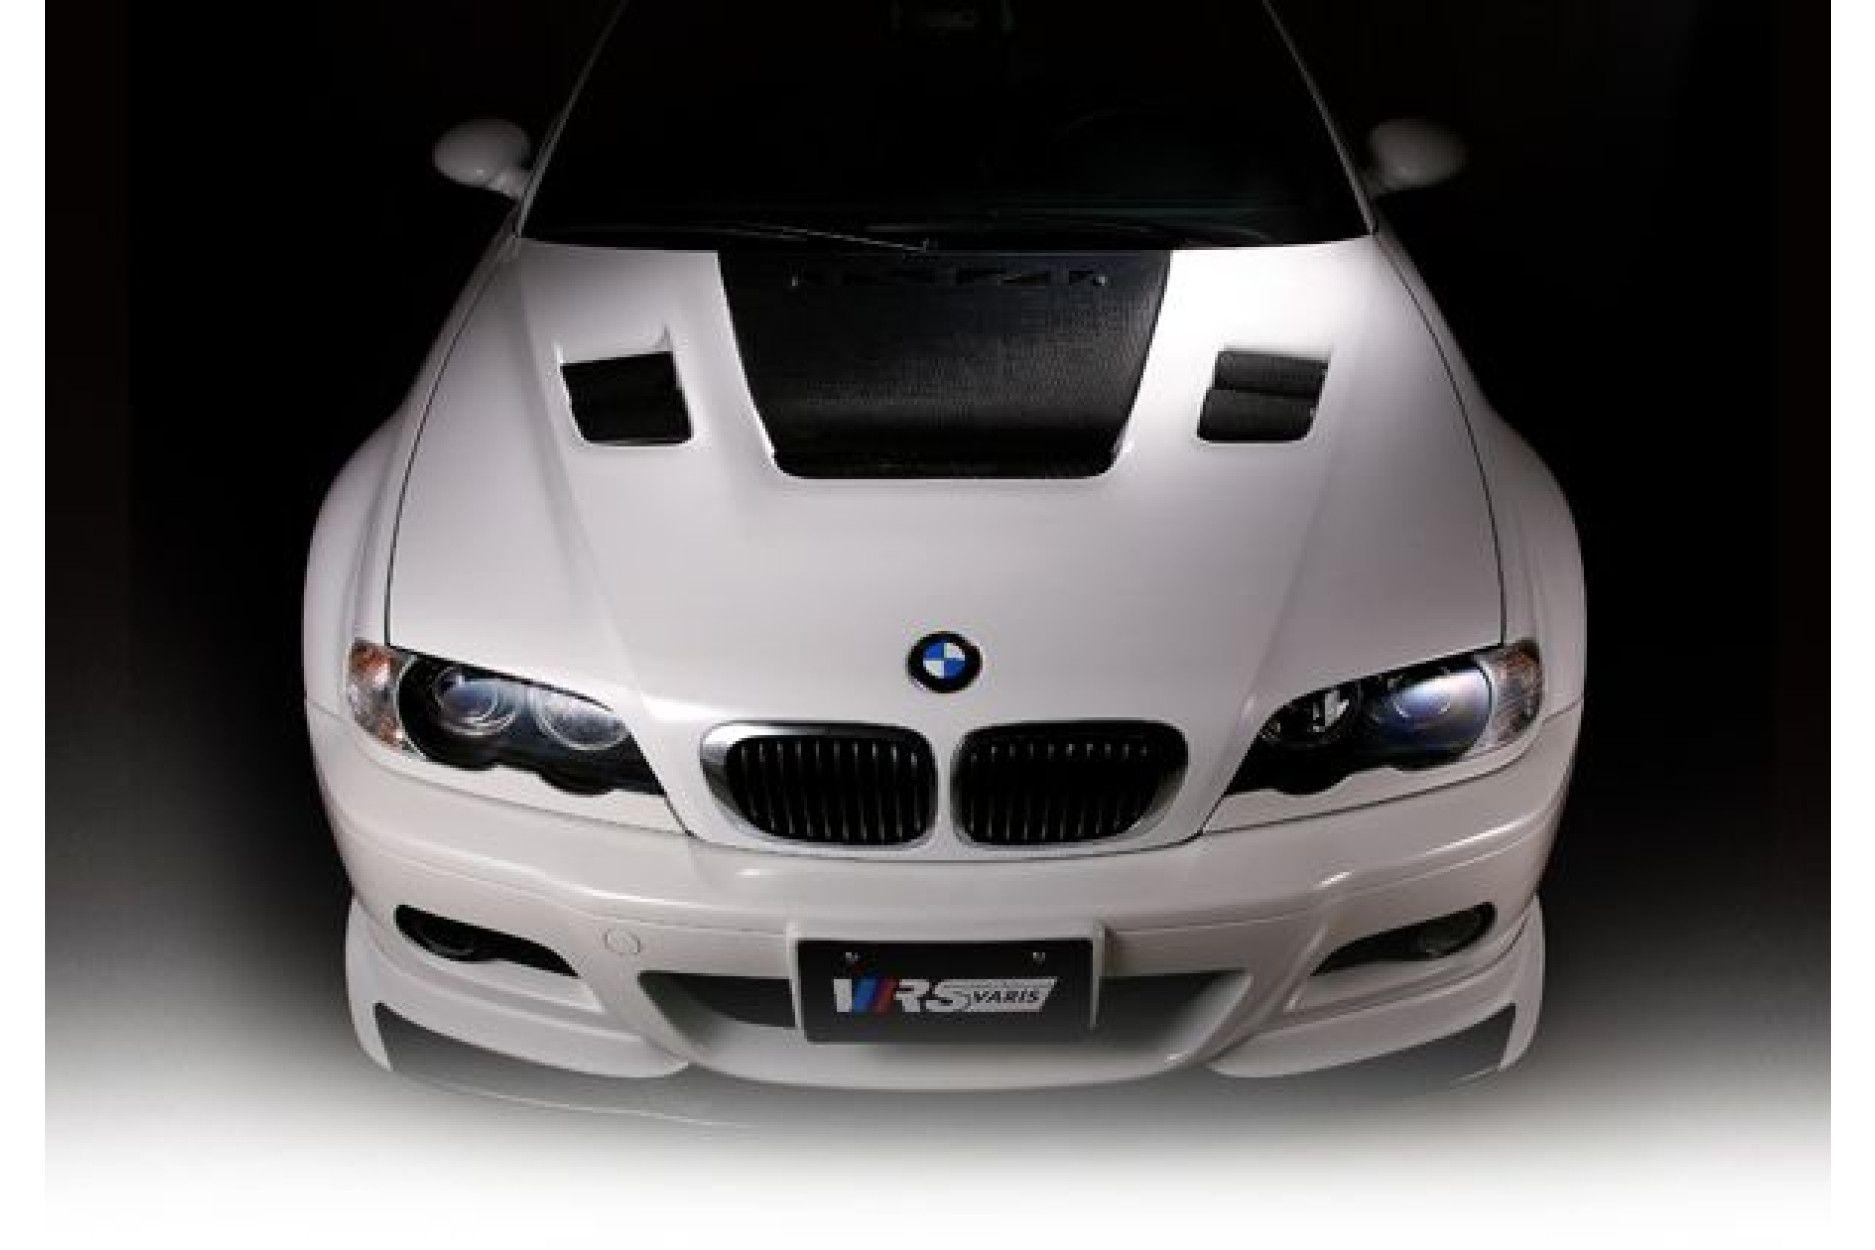 Varis Carbon Cooling Bonnet For Bmw E46 M3 Buy Online At Cfd